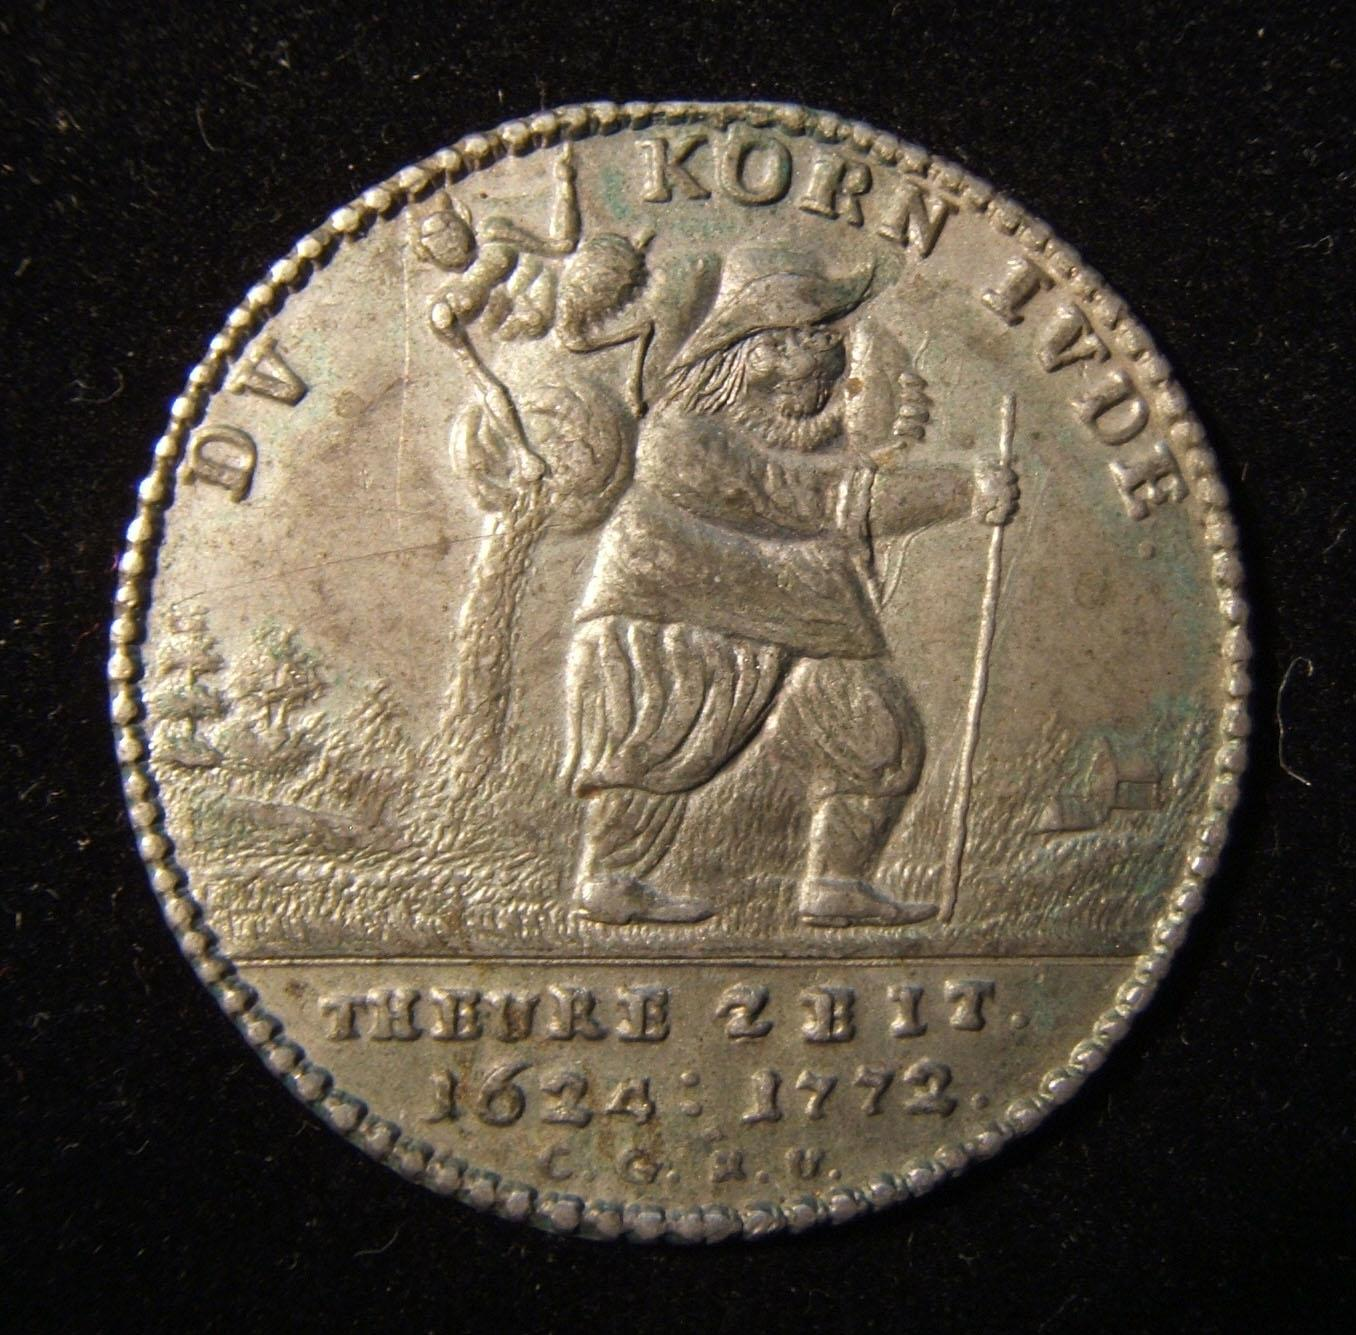 Germany > Sachsen-Thuringen: 'Corn Jew' medal w/ grain peddler, vertical sifter &